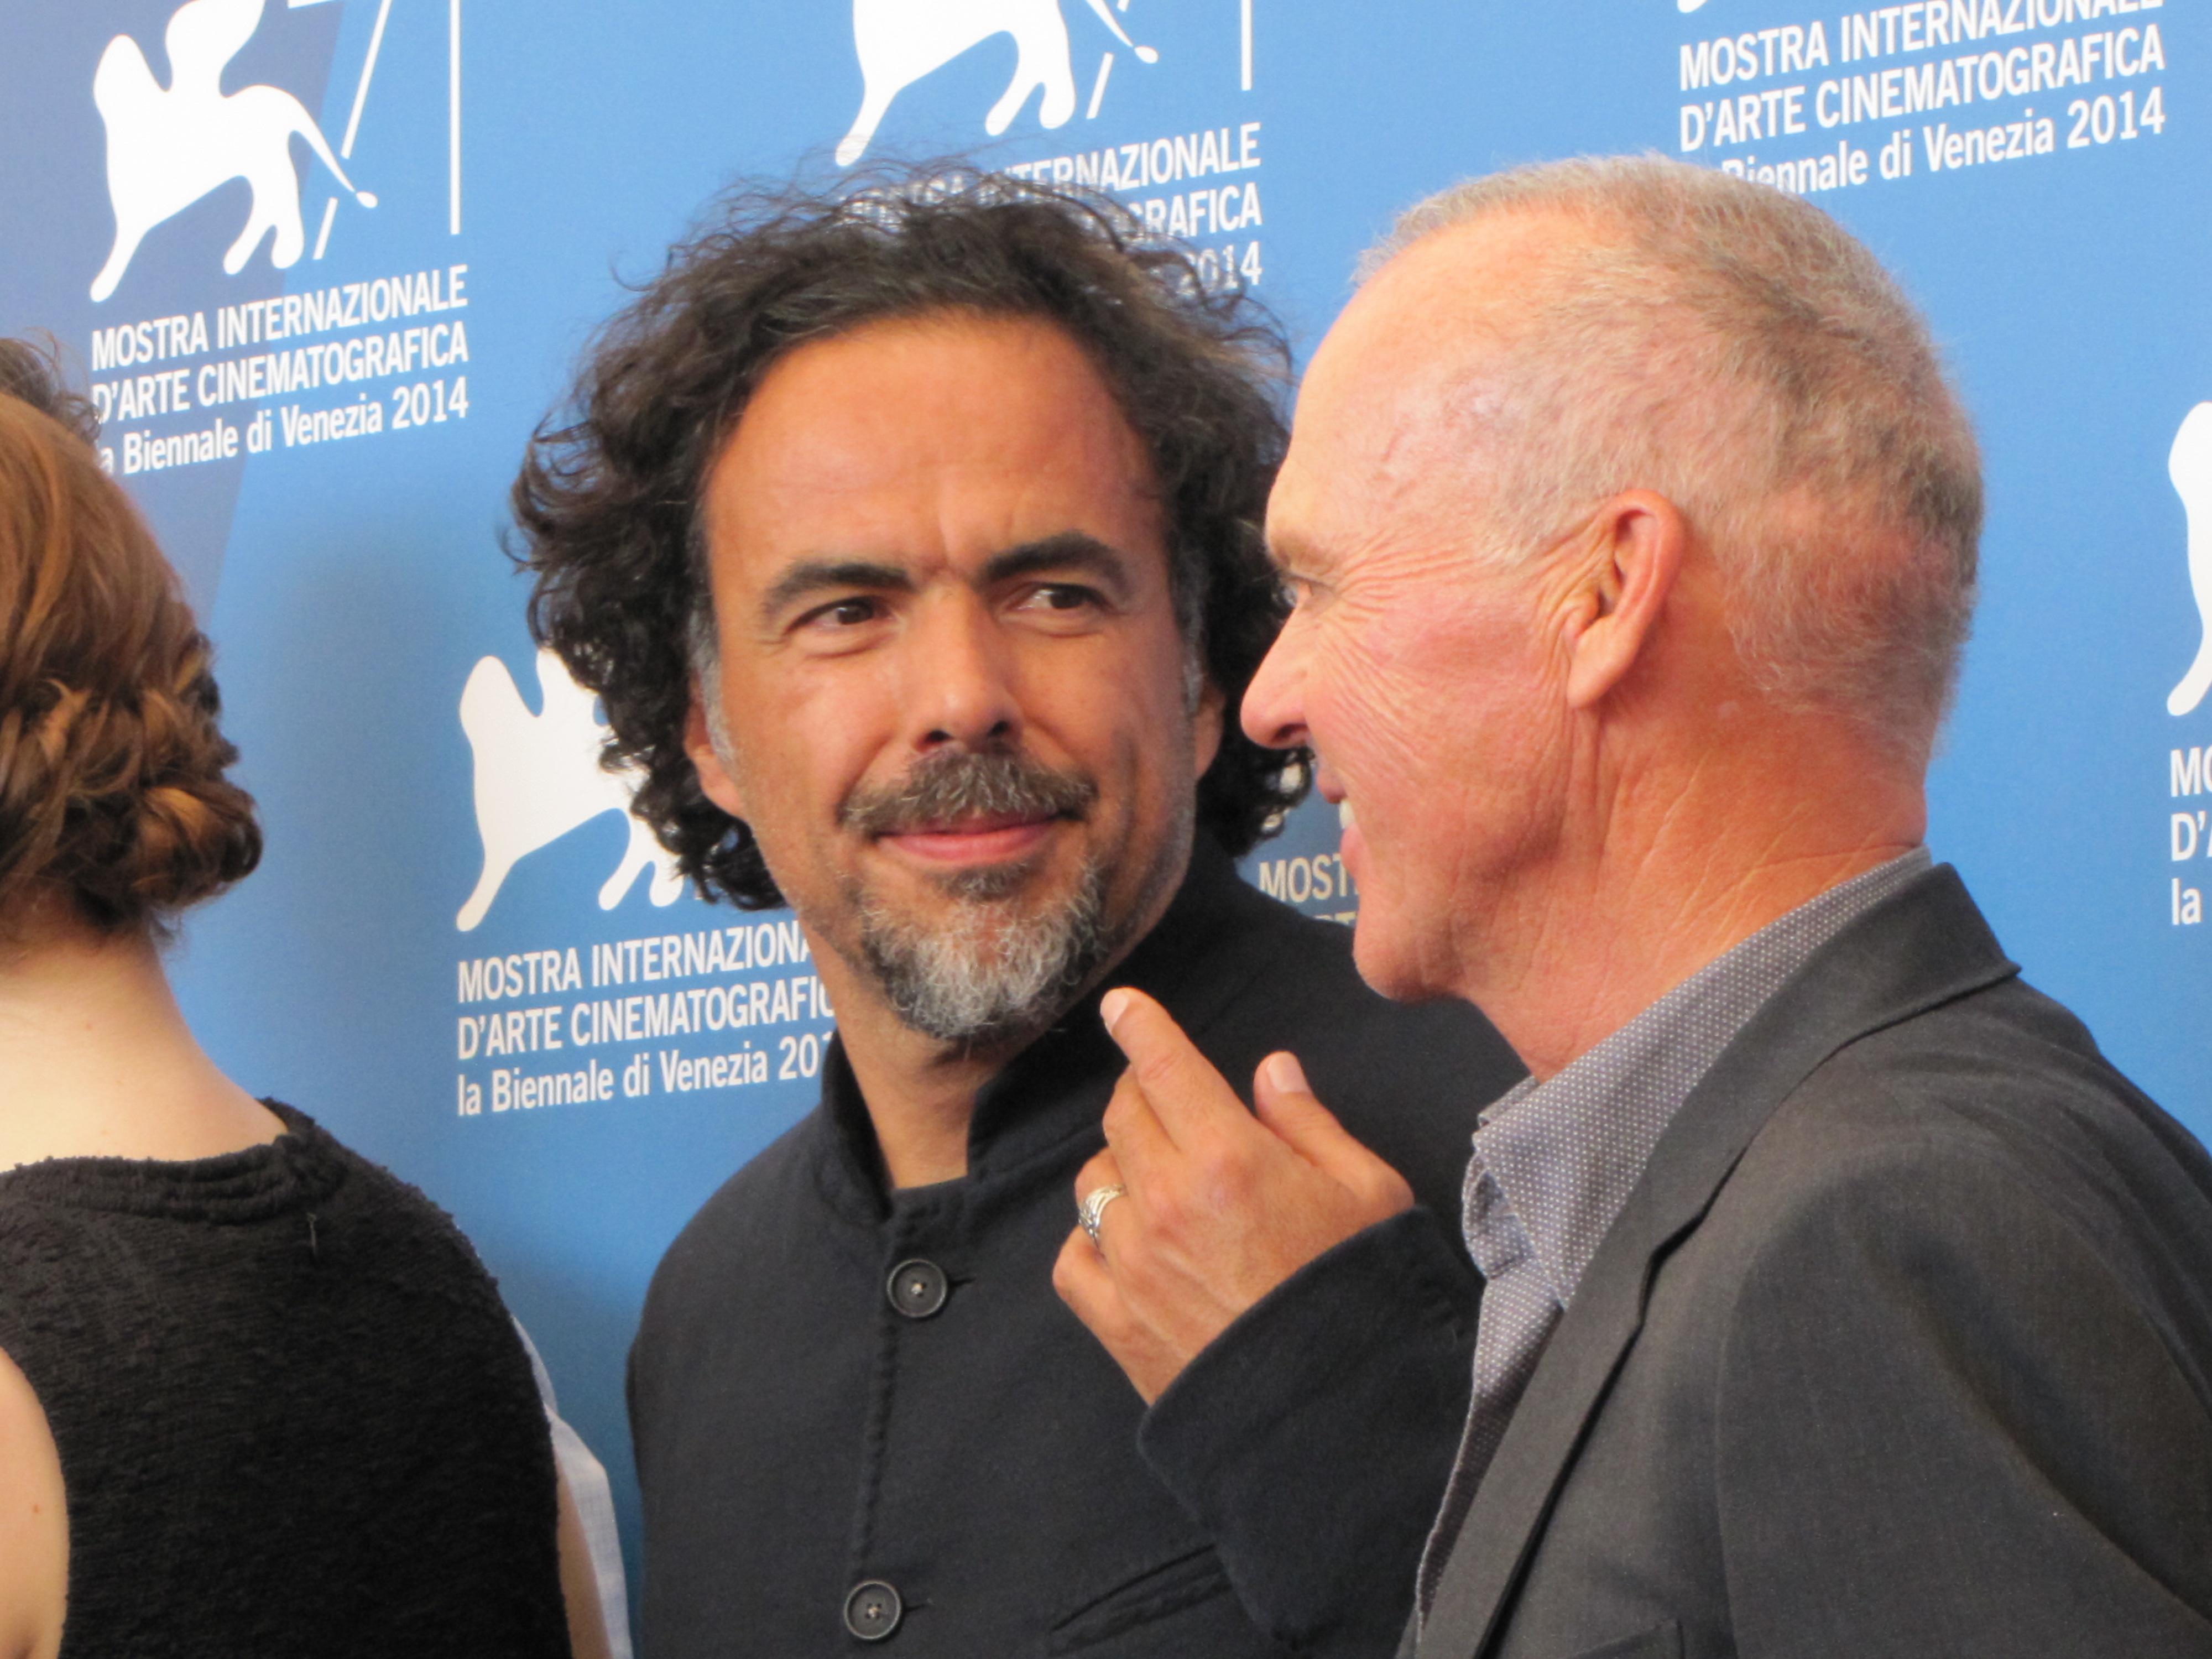 Inarritu e Michael Keaton a Venezia 2014 con Birdmman